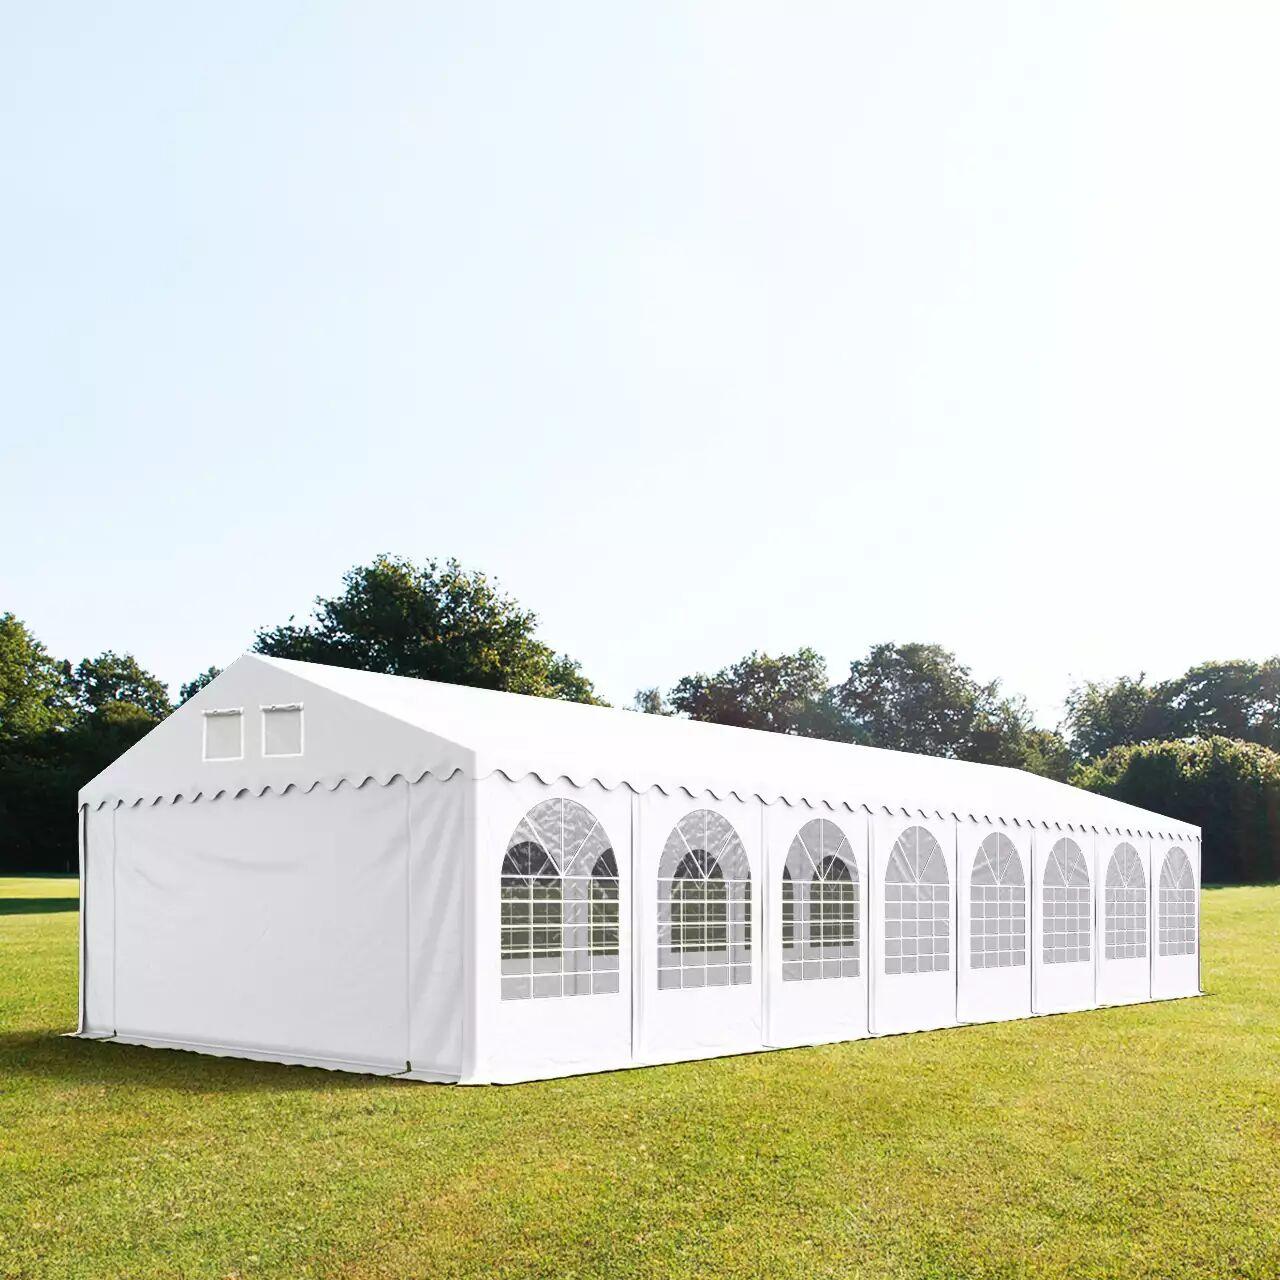 Toolport Tendone per Feste 6x24m PVC 550 g/m² bianco impermeabile